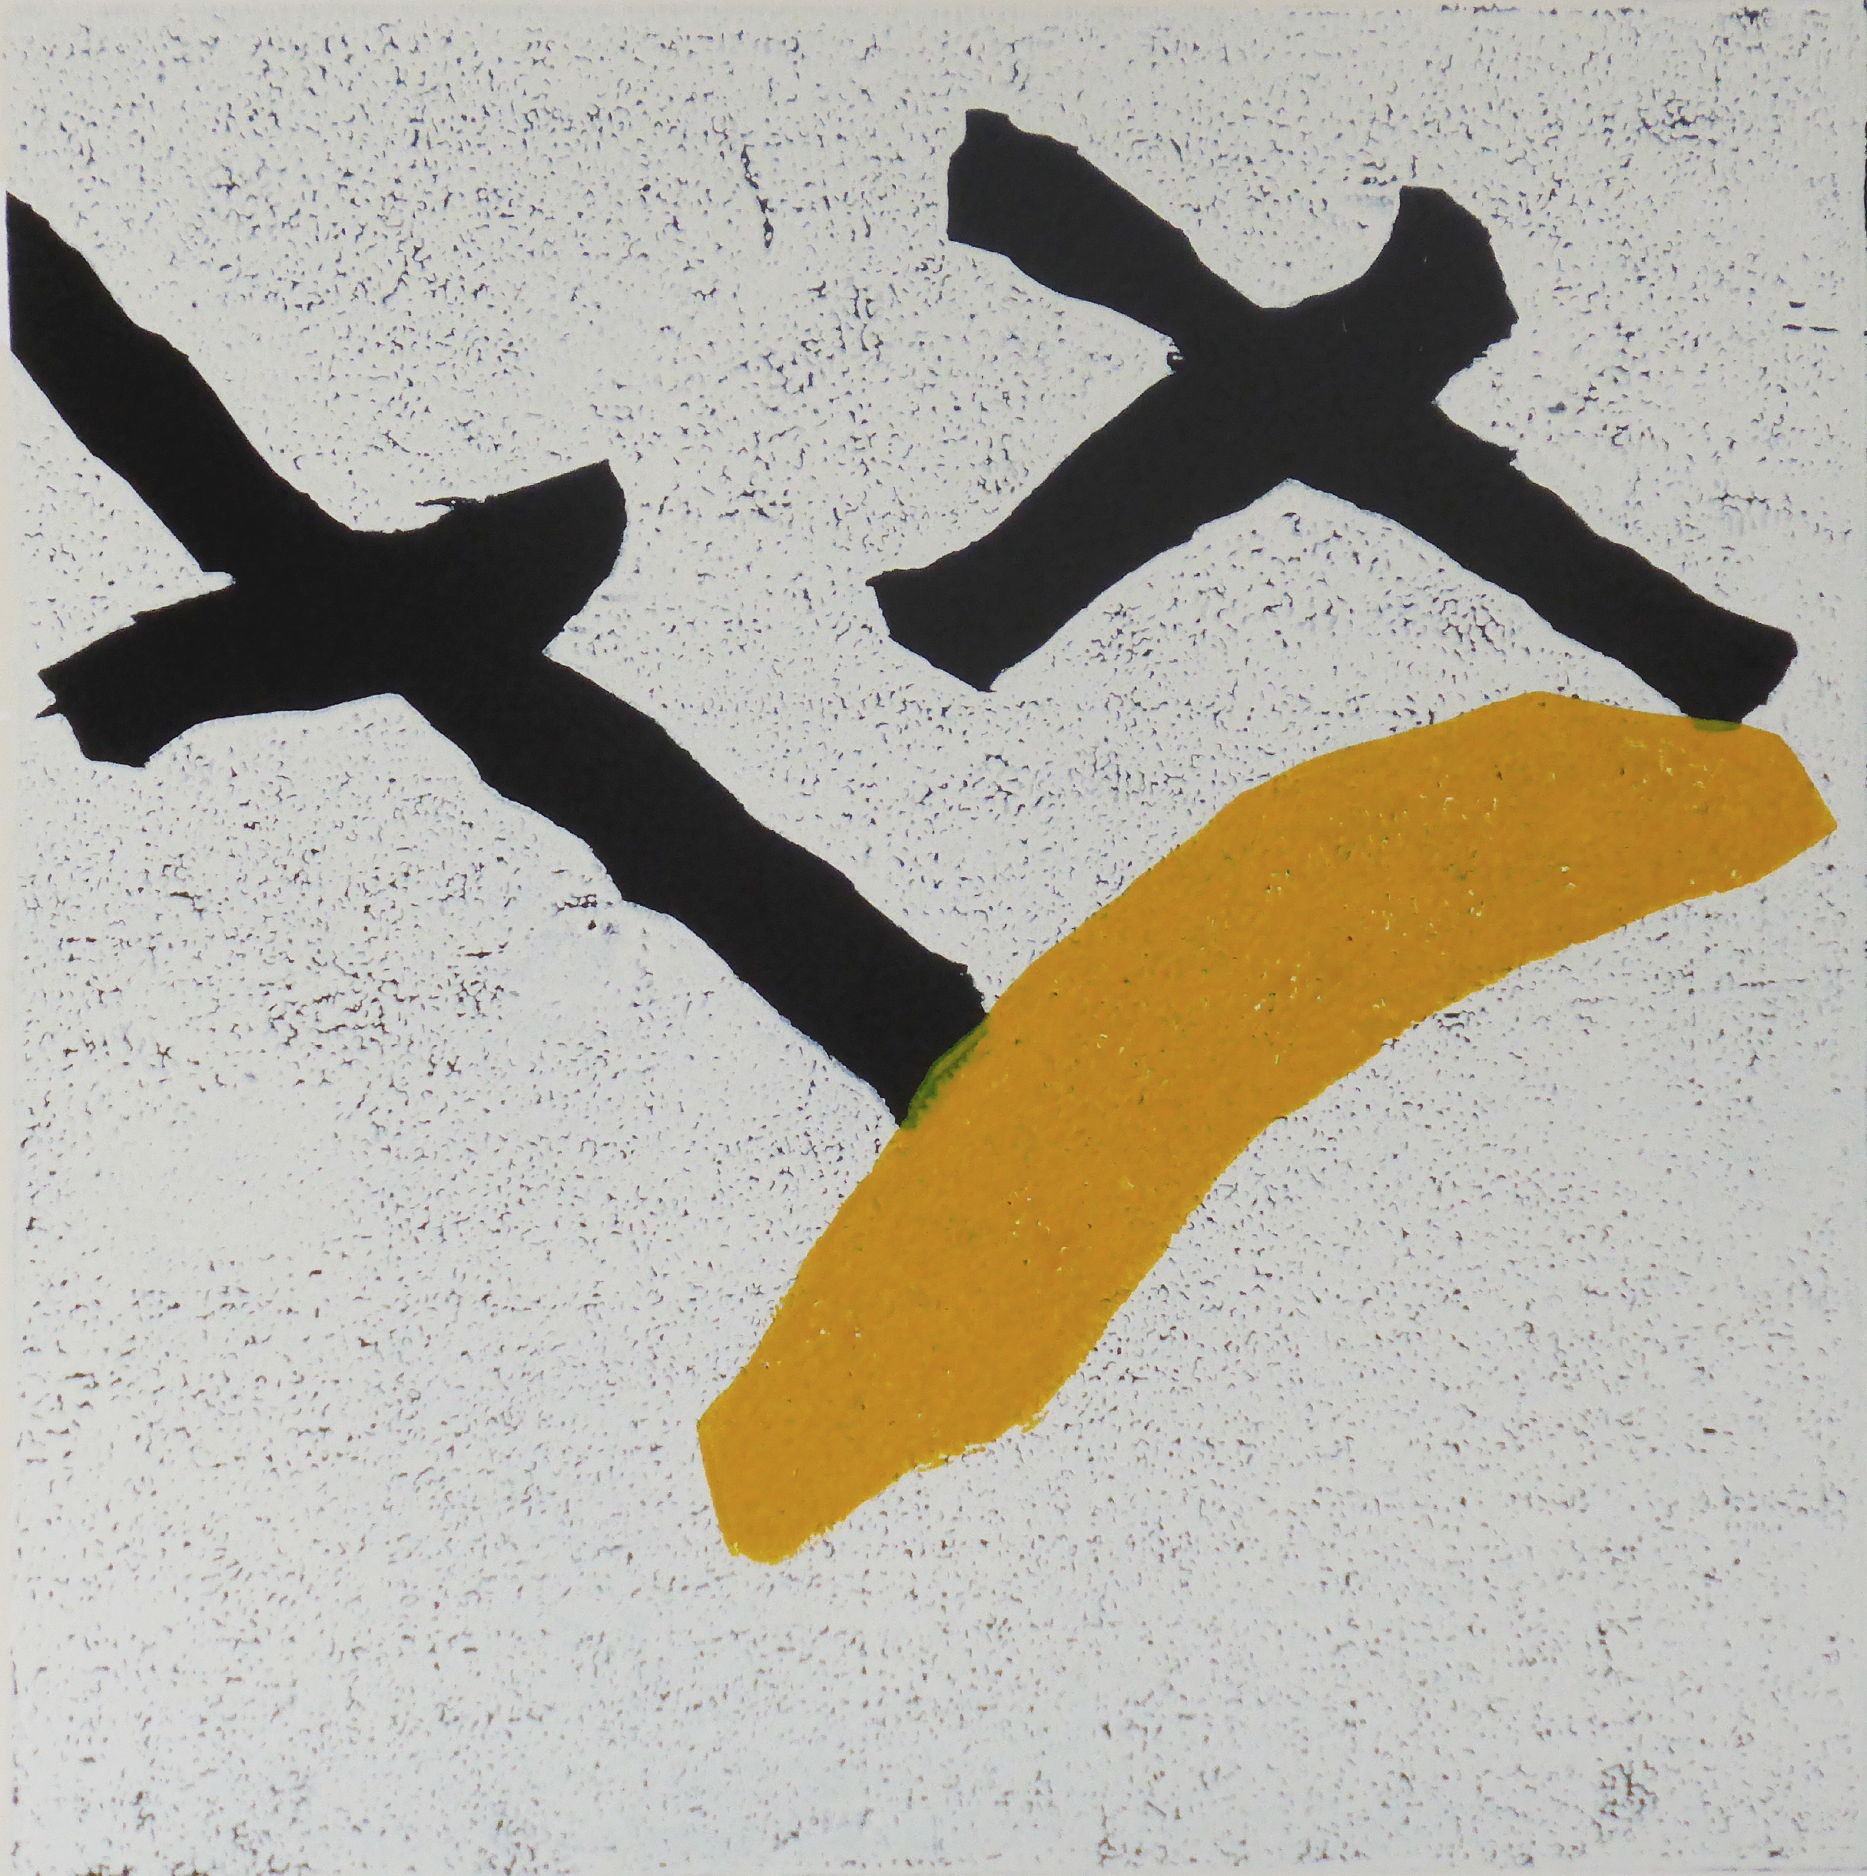 Tangentia 1, Farbholzschnitt, 35x35cm, 2014